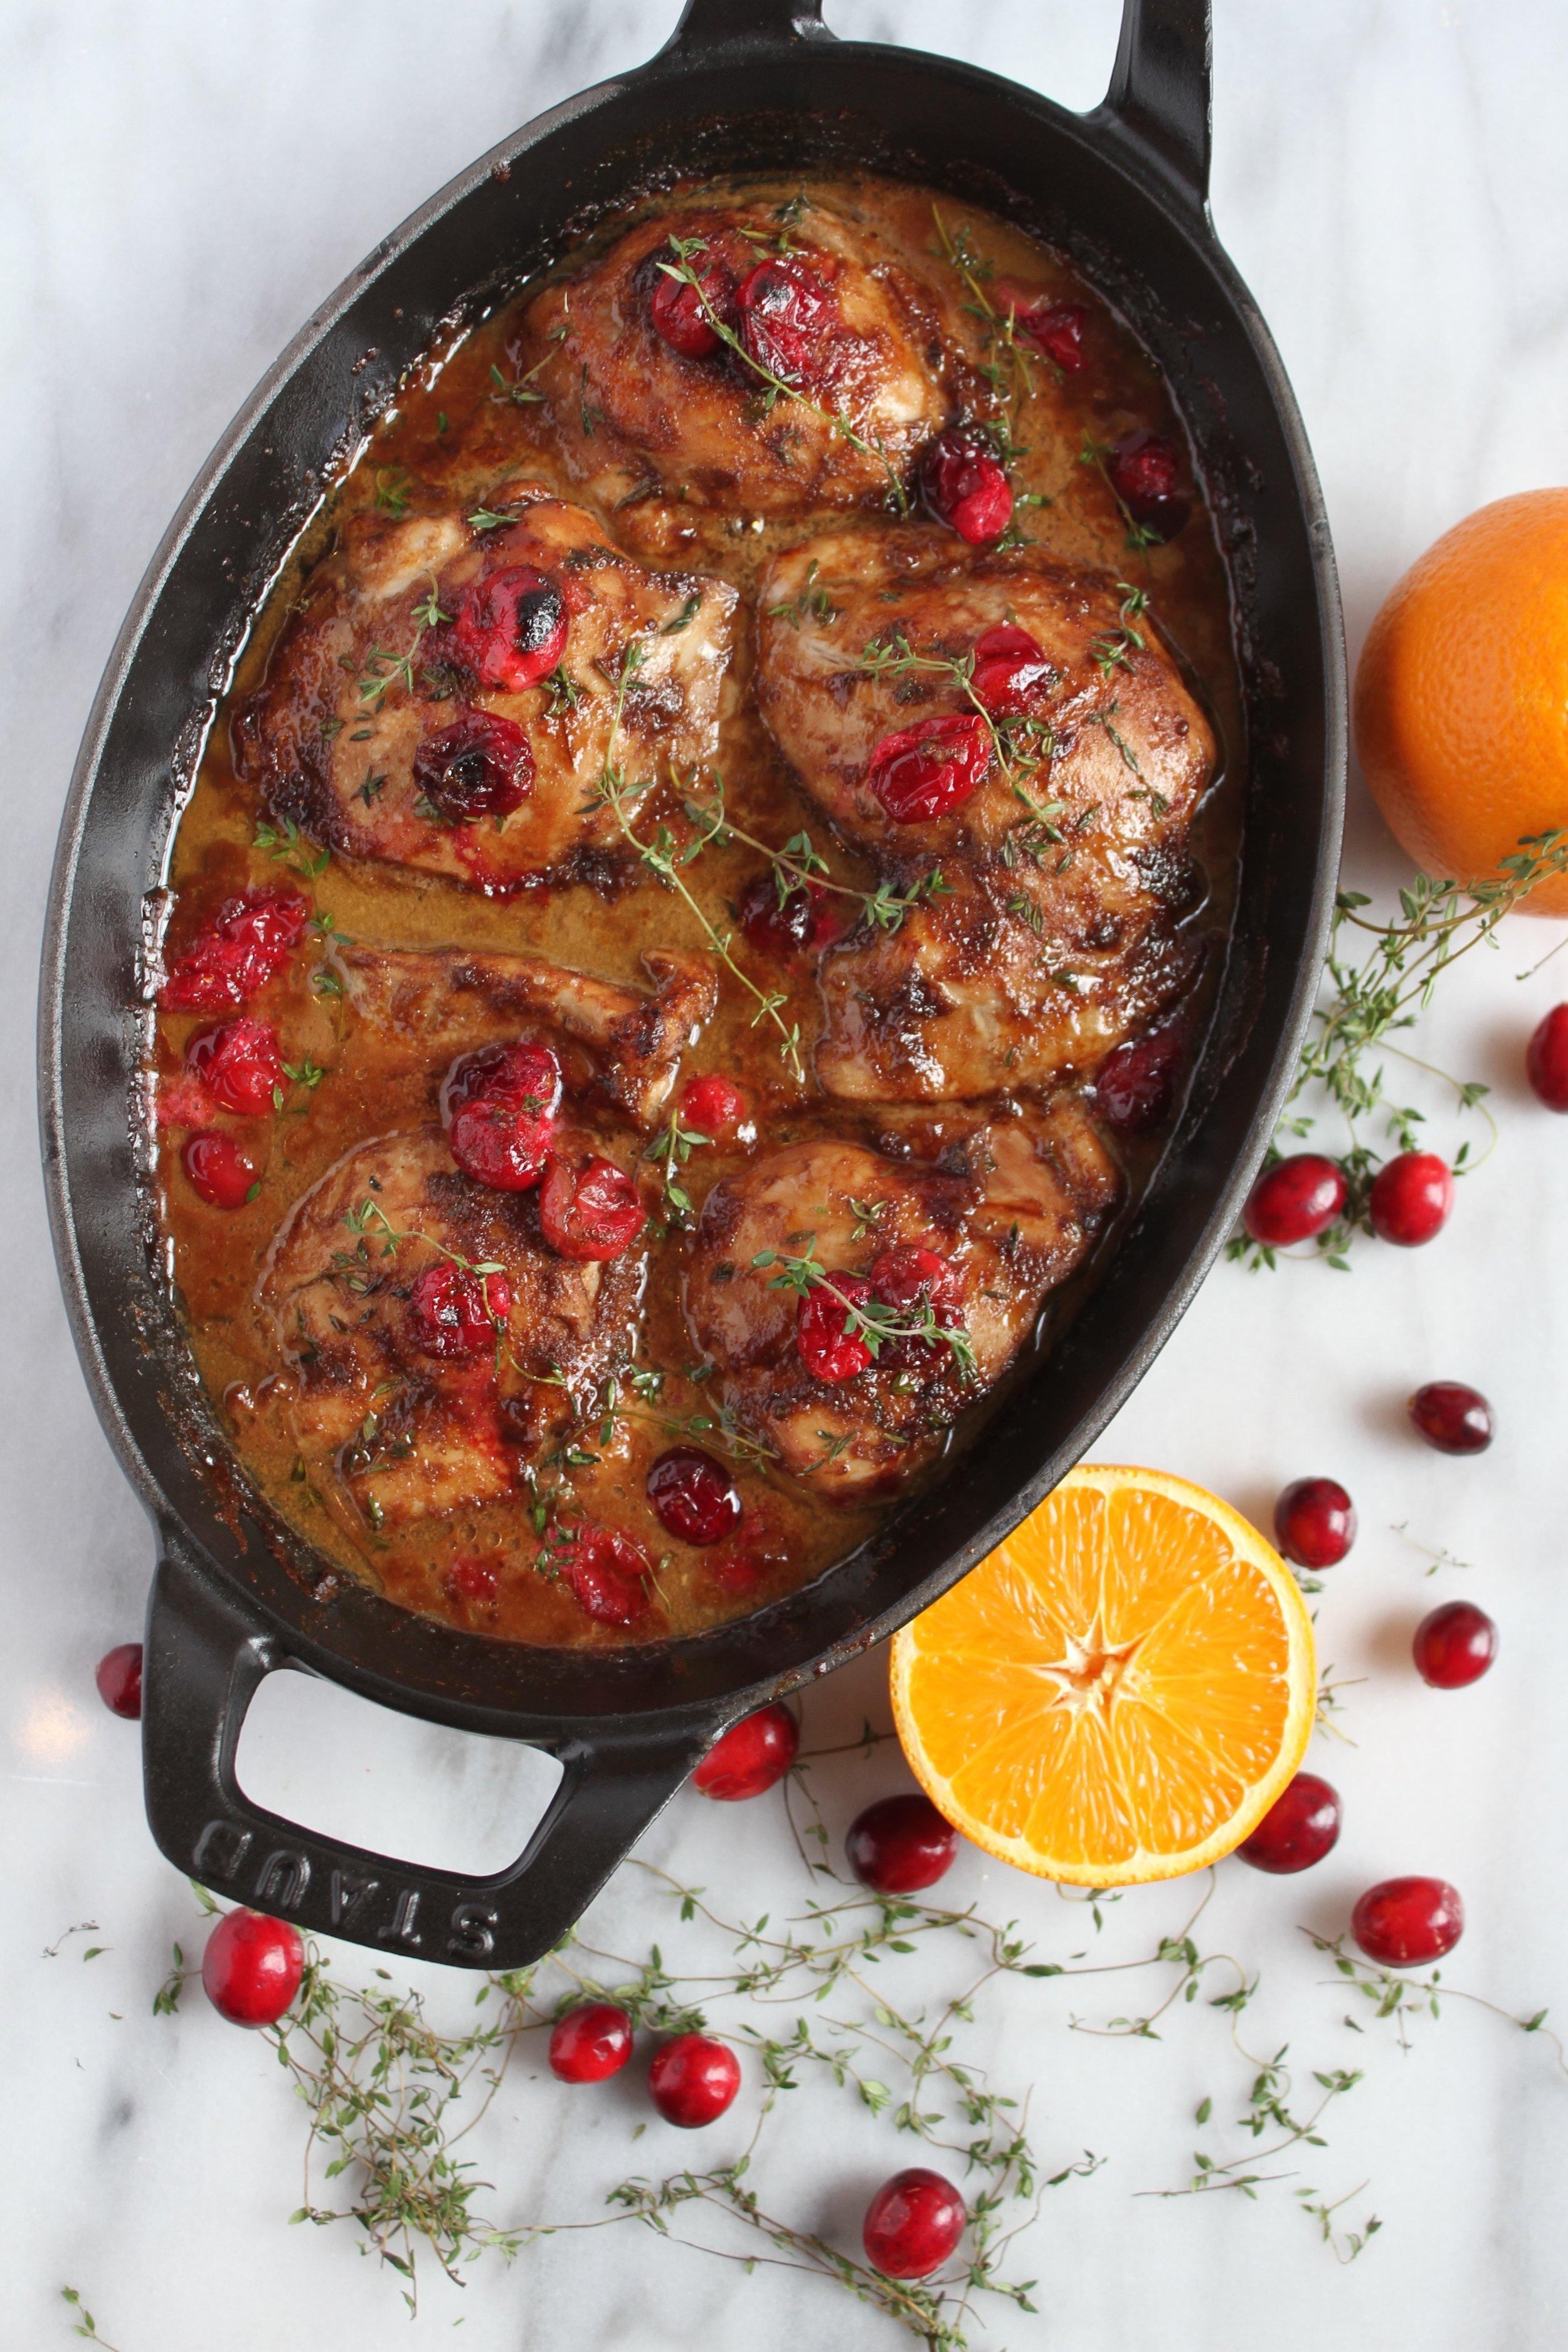 Roasted Cranberry Orange Maple Chicken w:Vitamix x Living Minnaly _8.jpg